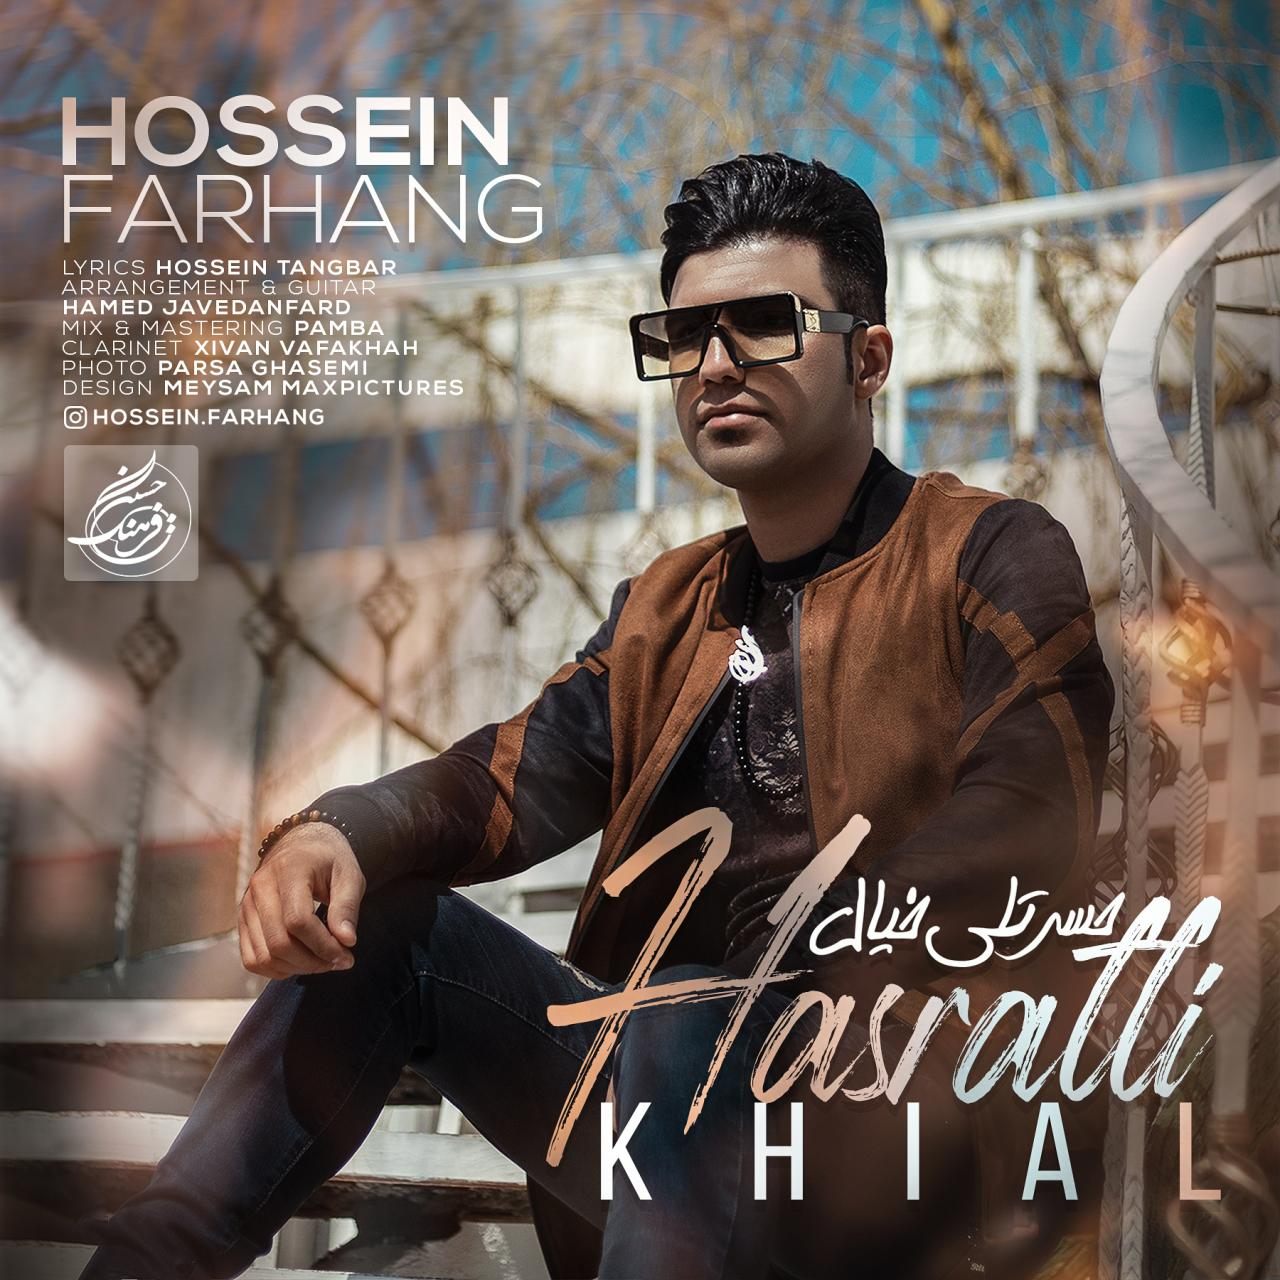 Hossein Farhang – Hasratli Khial